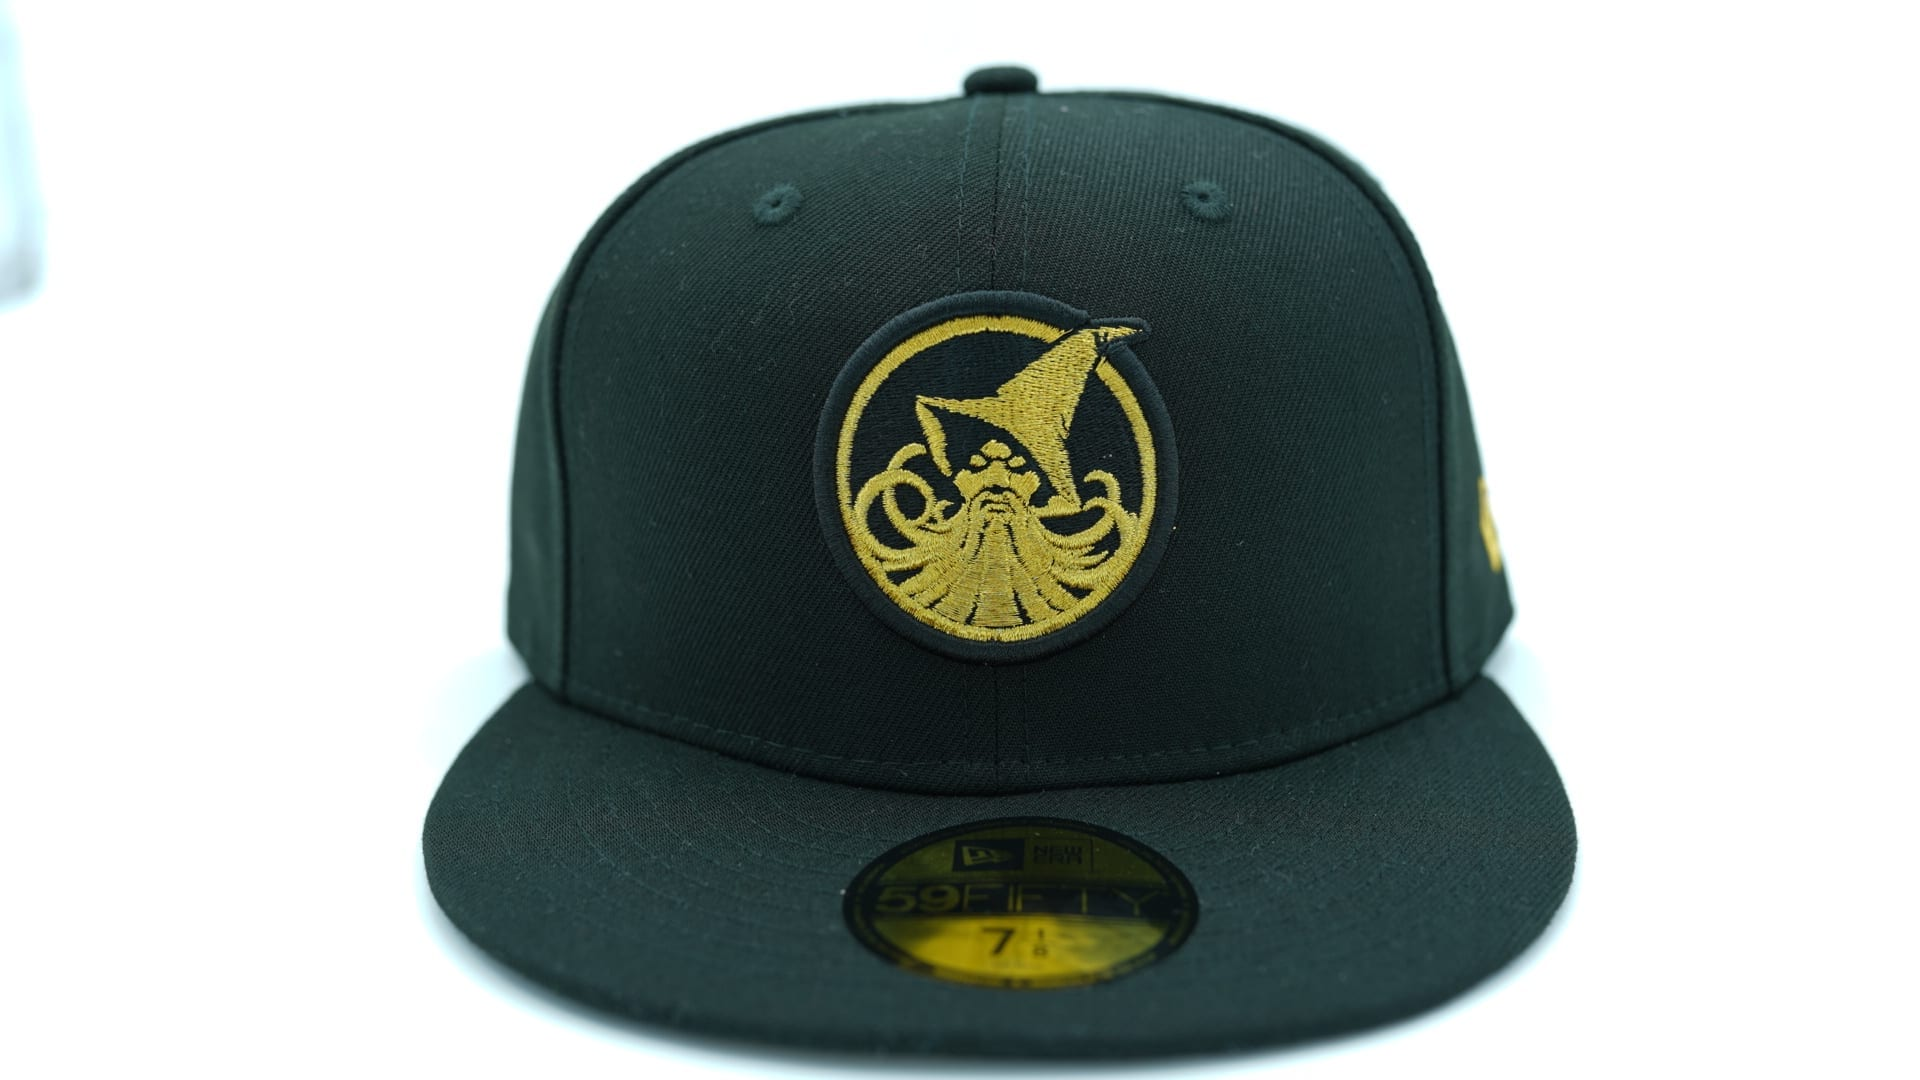 boston celtics team black leather 59fifty fitted baseball cap new era nba